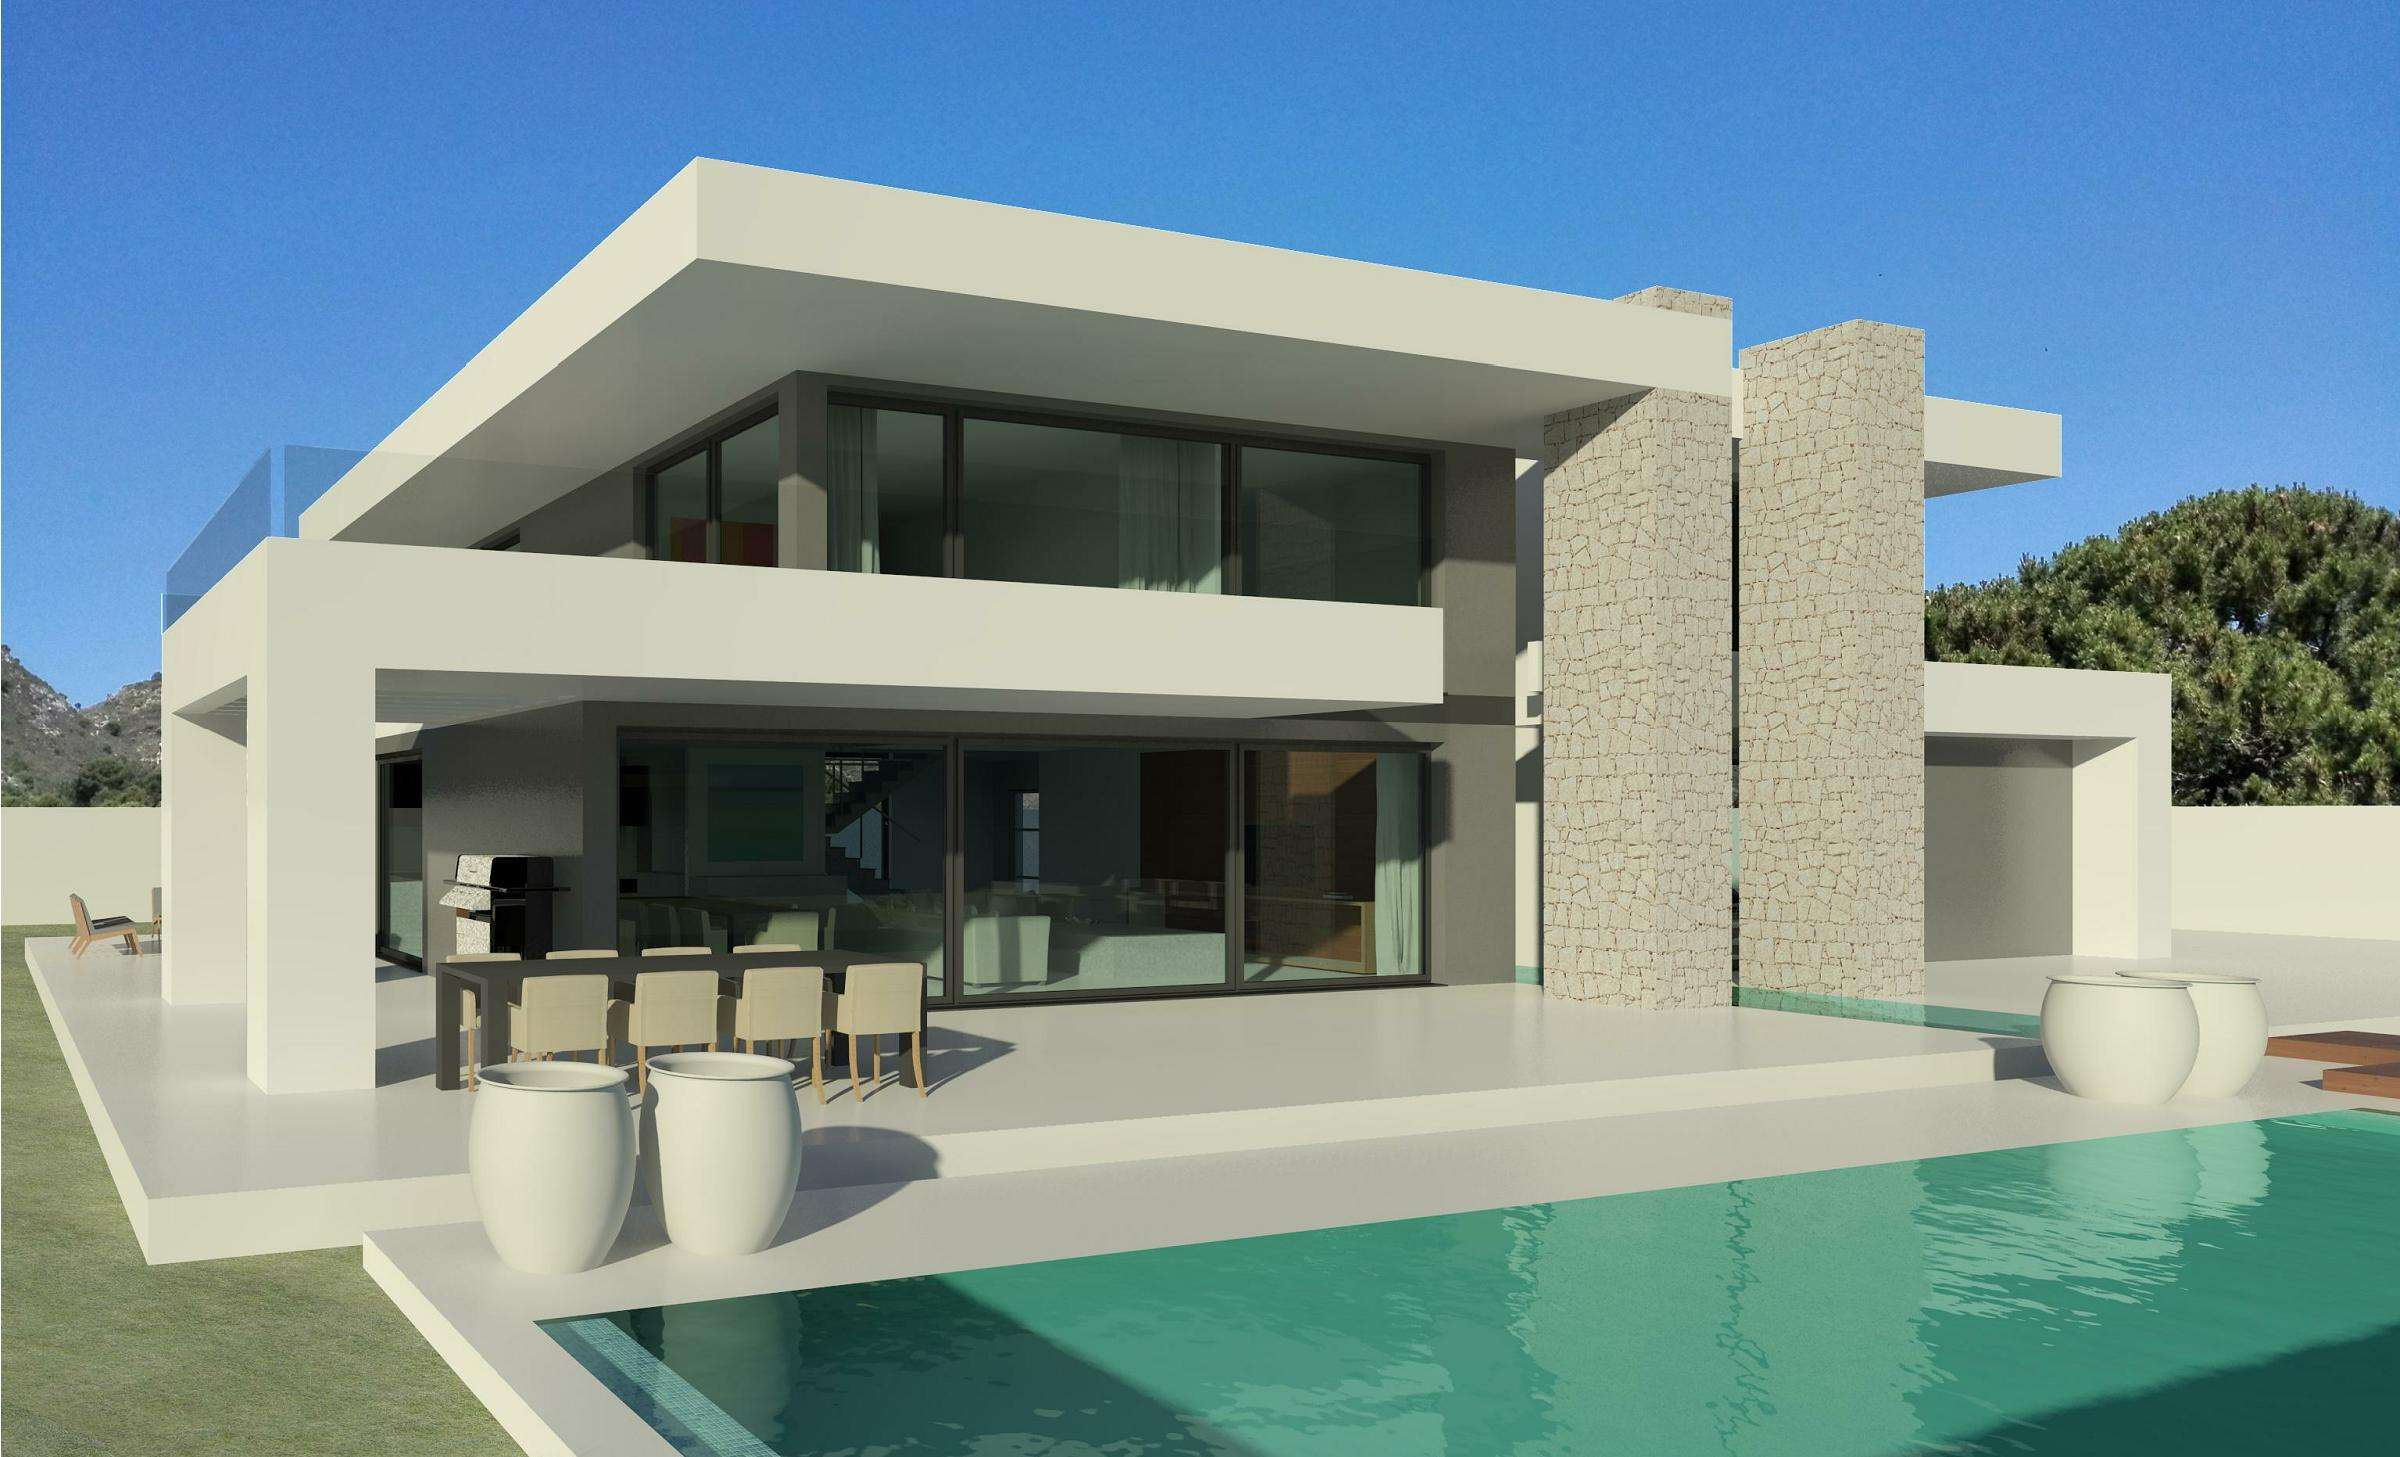 Beautiful Houses Compound Wall Designs Kerala House